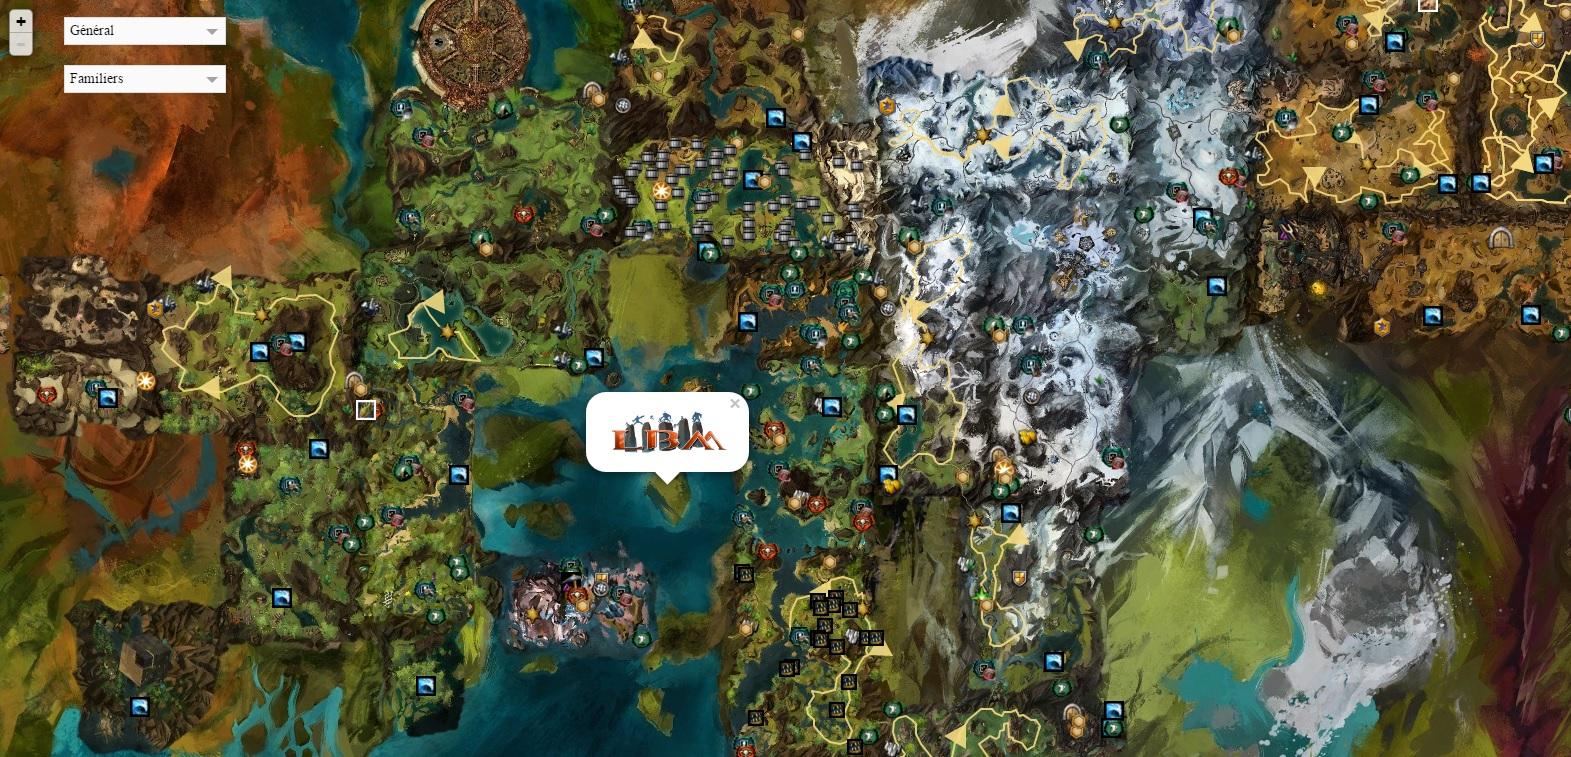 Gw2 Karte.Carte Exploration Lbm